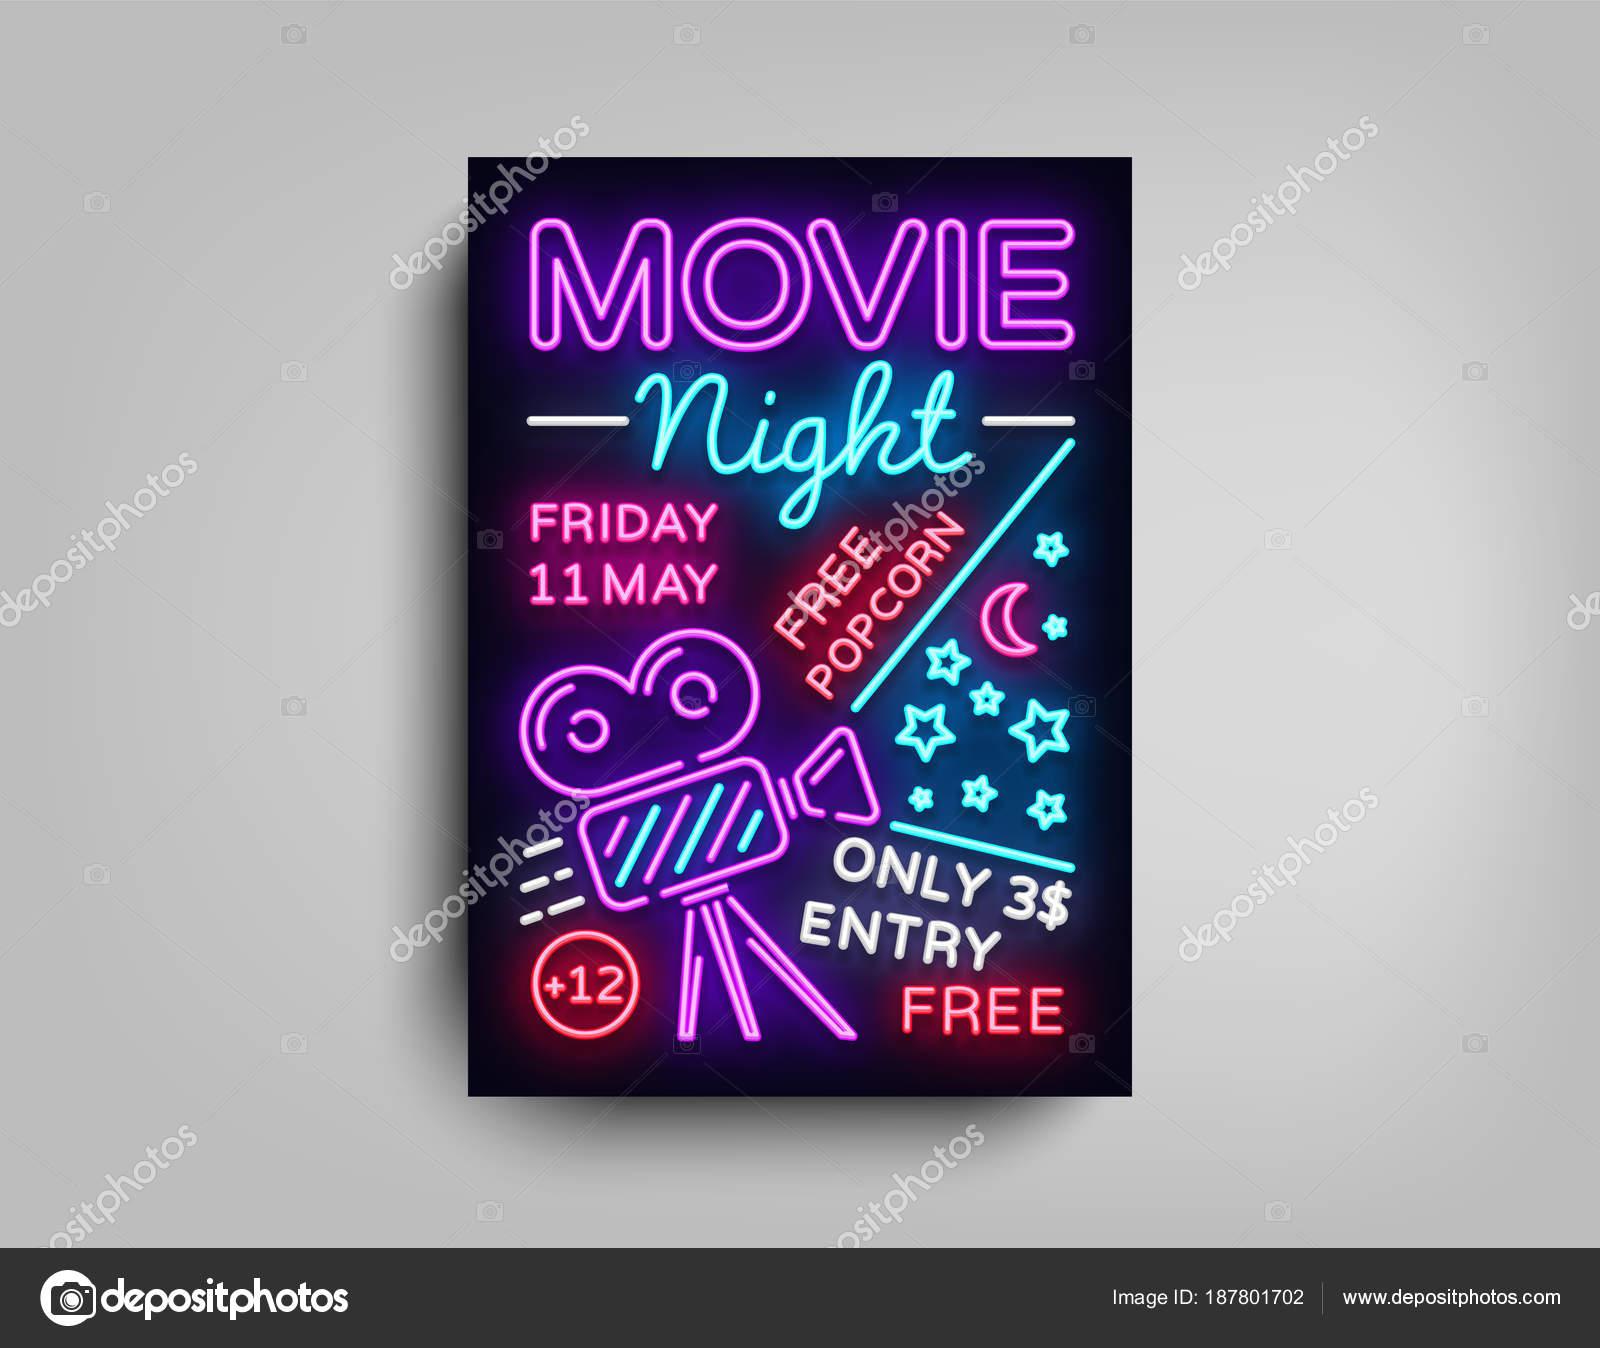 movie night poster design template in neon style neon sign light banner bright light flyer design postcard promotional brochure neon night cinema